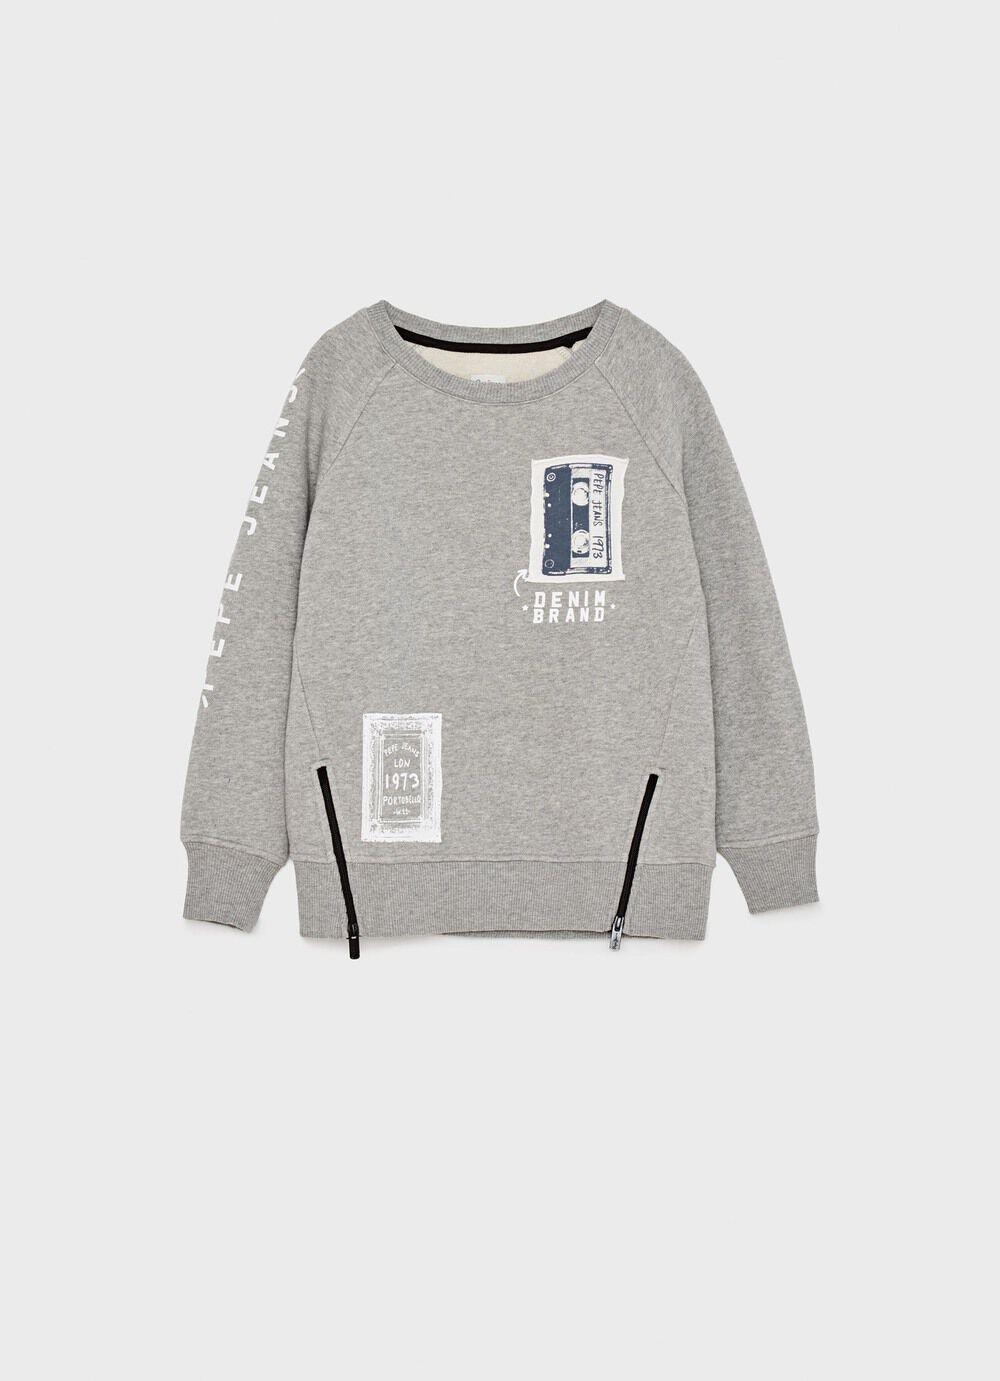 Retro Sweatshirt | Women Sweaters & Knits | Pitch Black